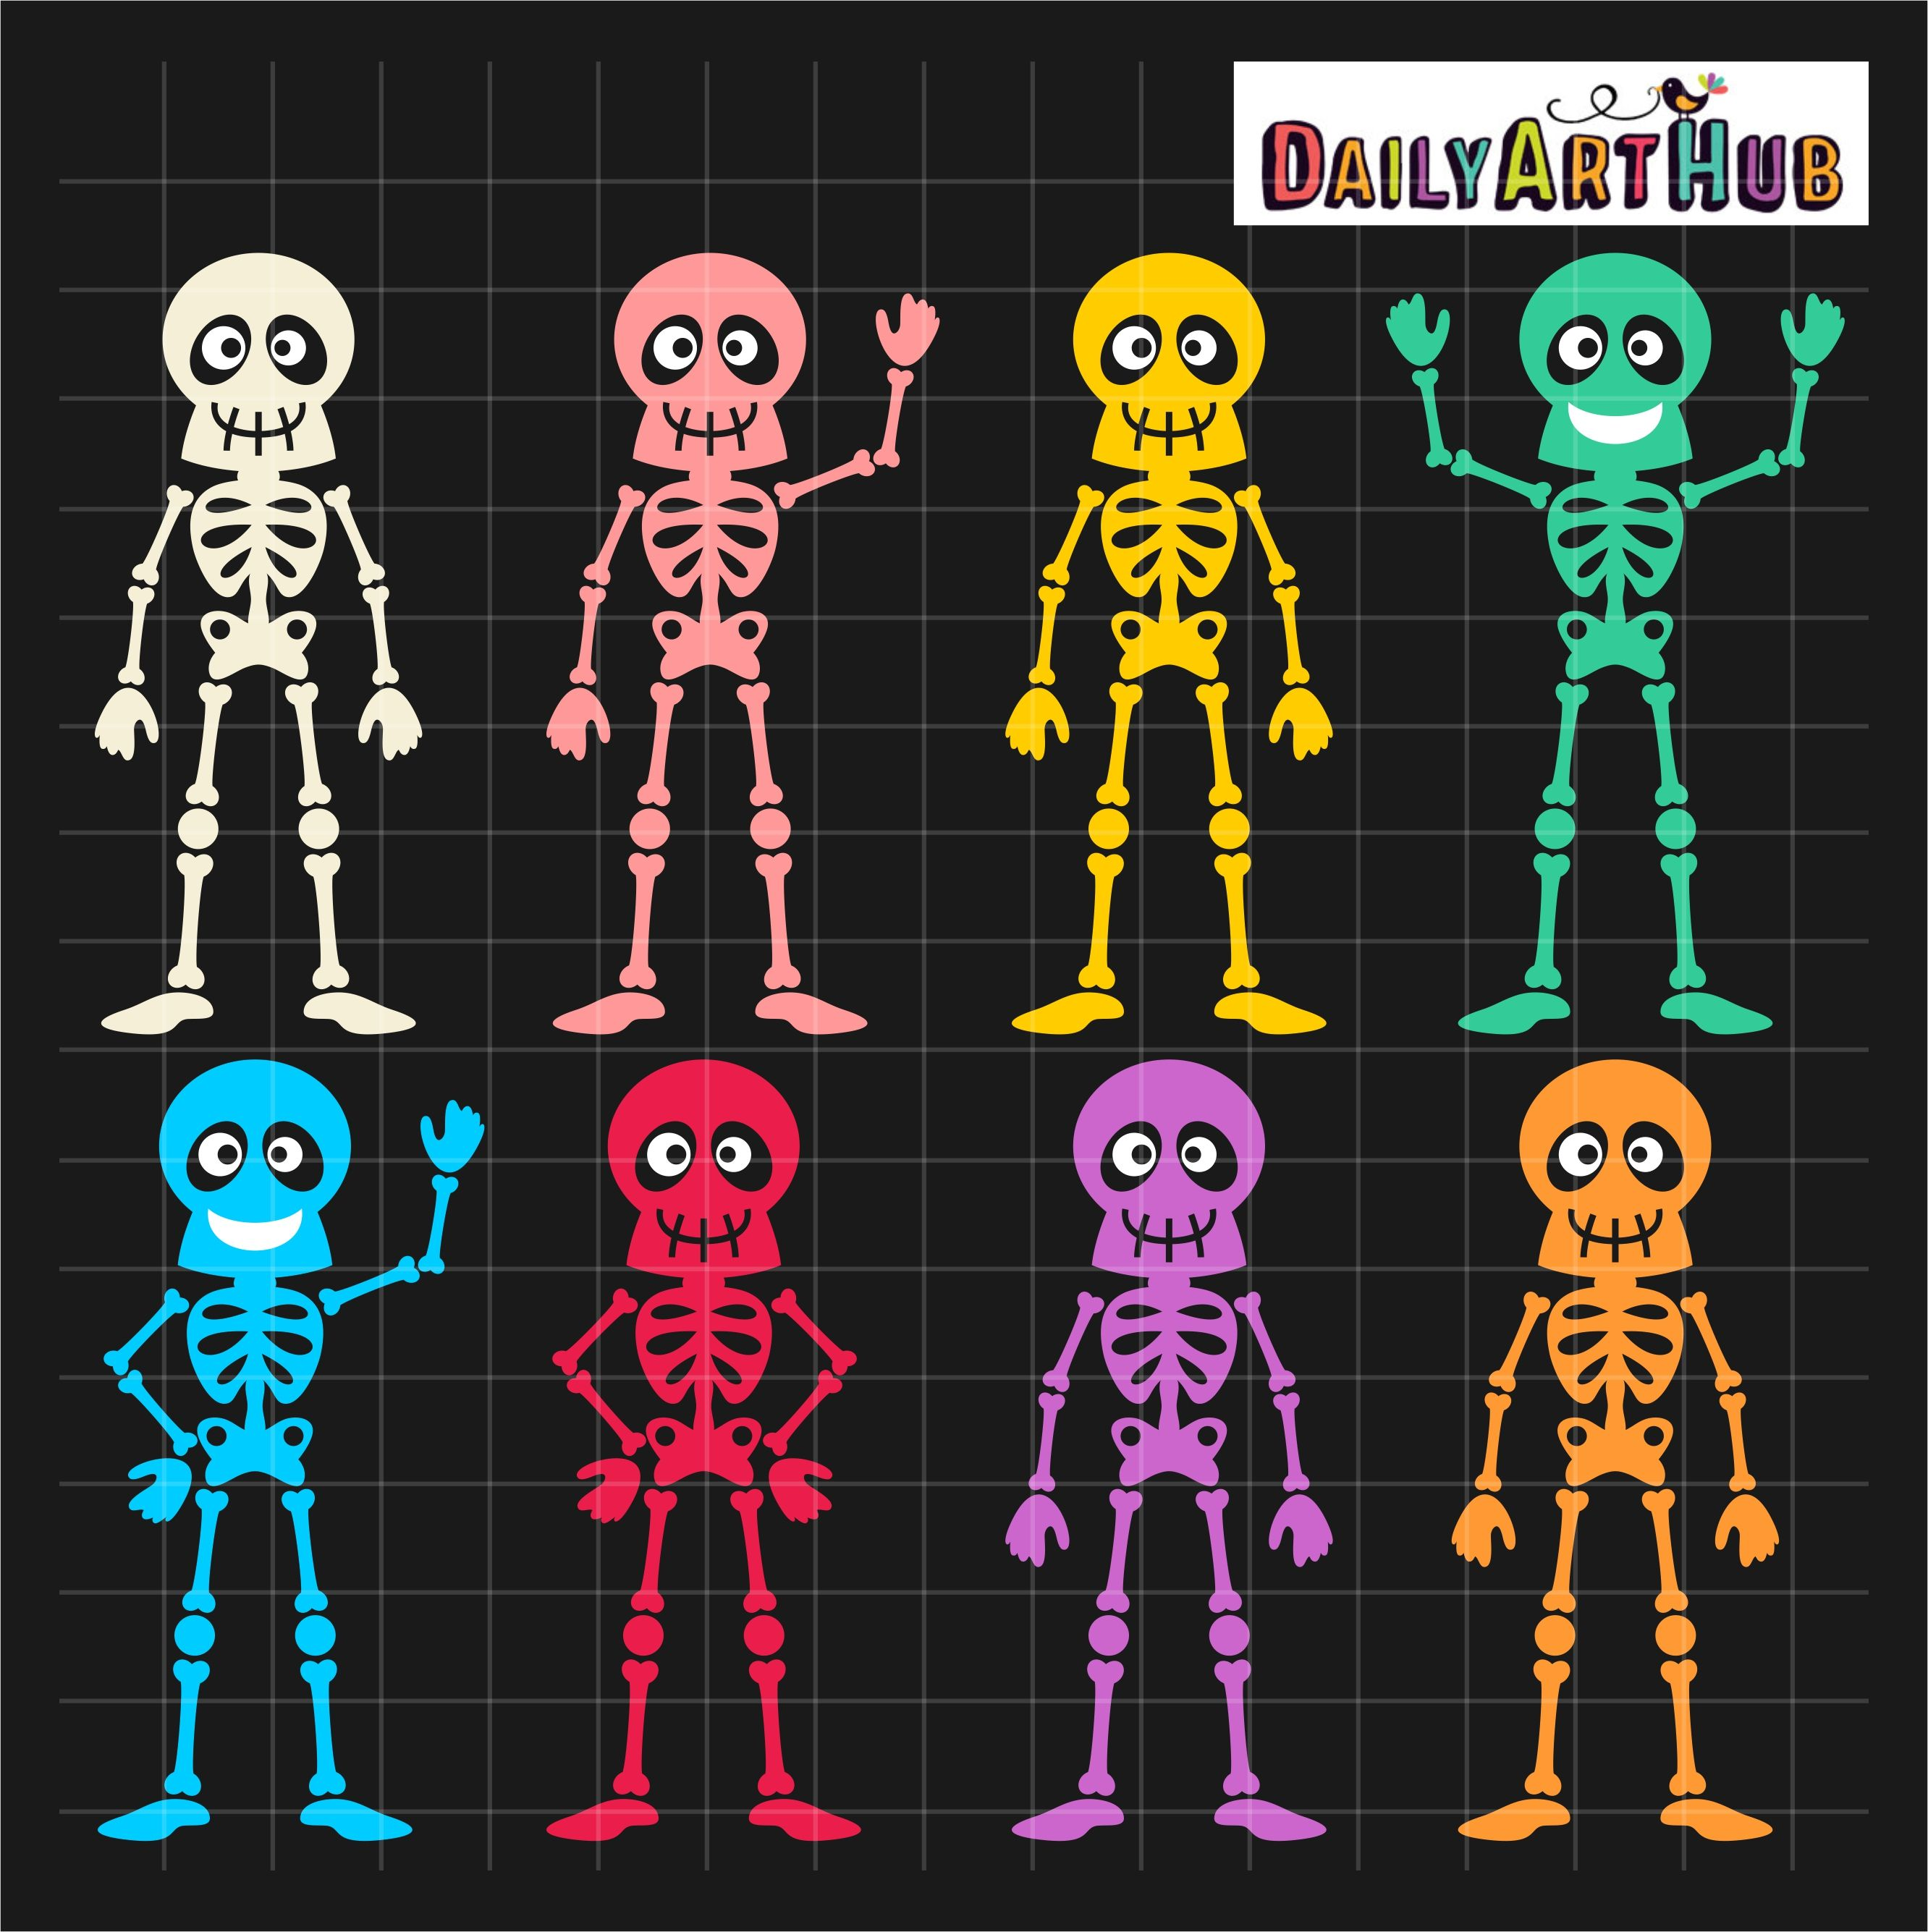 Halloween Funny Skeletons Clip Art Set Daily Art Hub